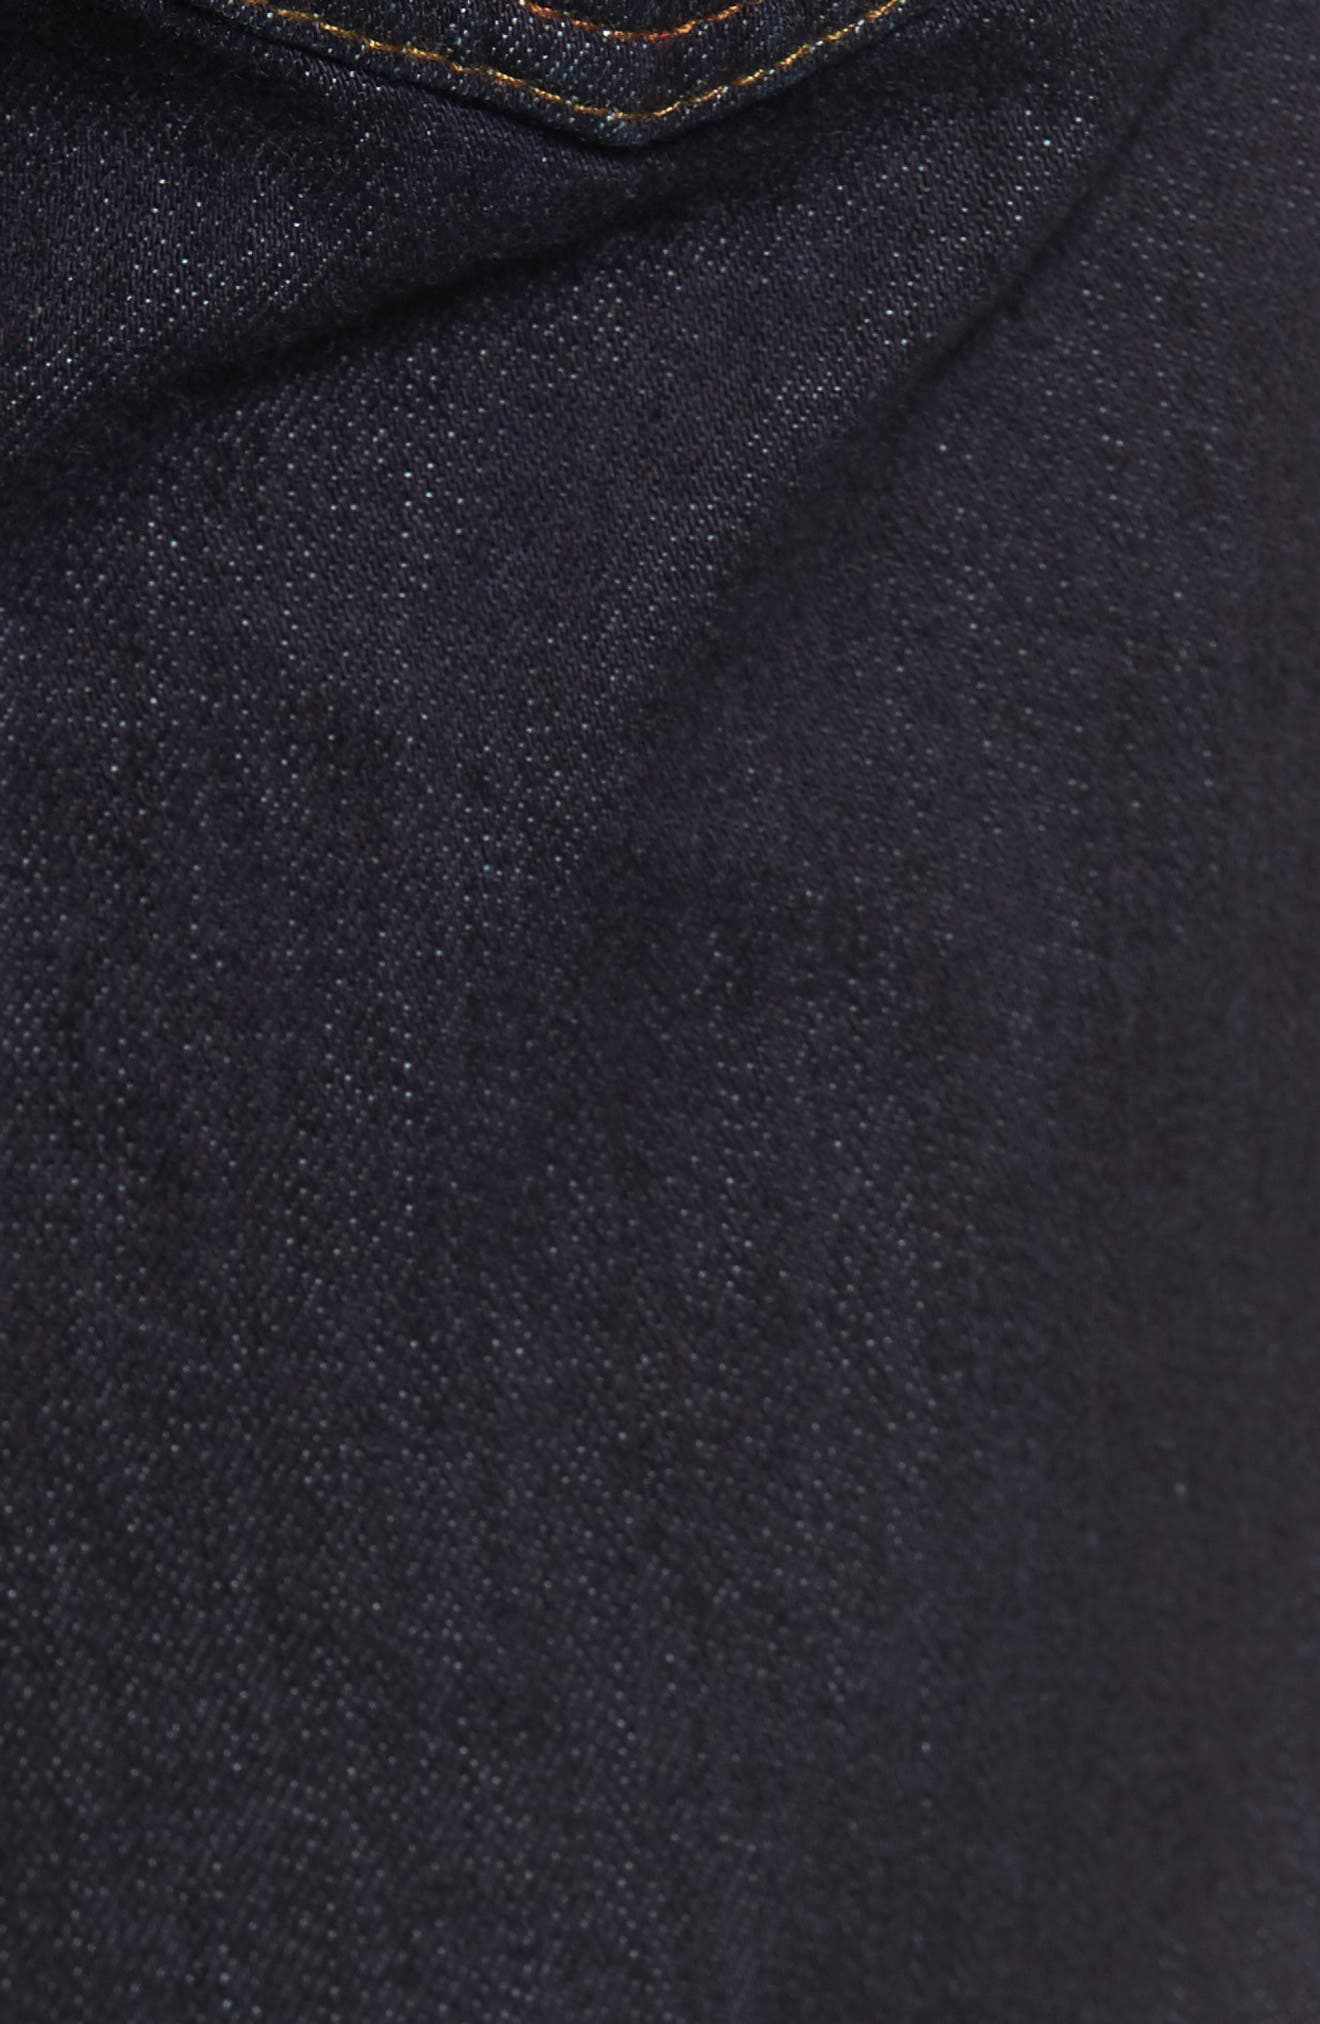 Canal Slim Fit Jeans,                             Alternate thumbnail 5, color,                             460